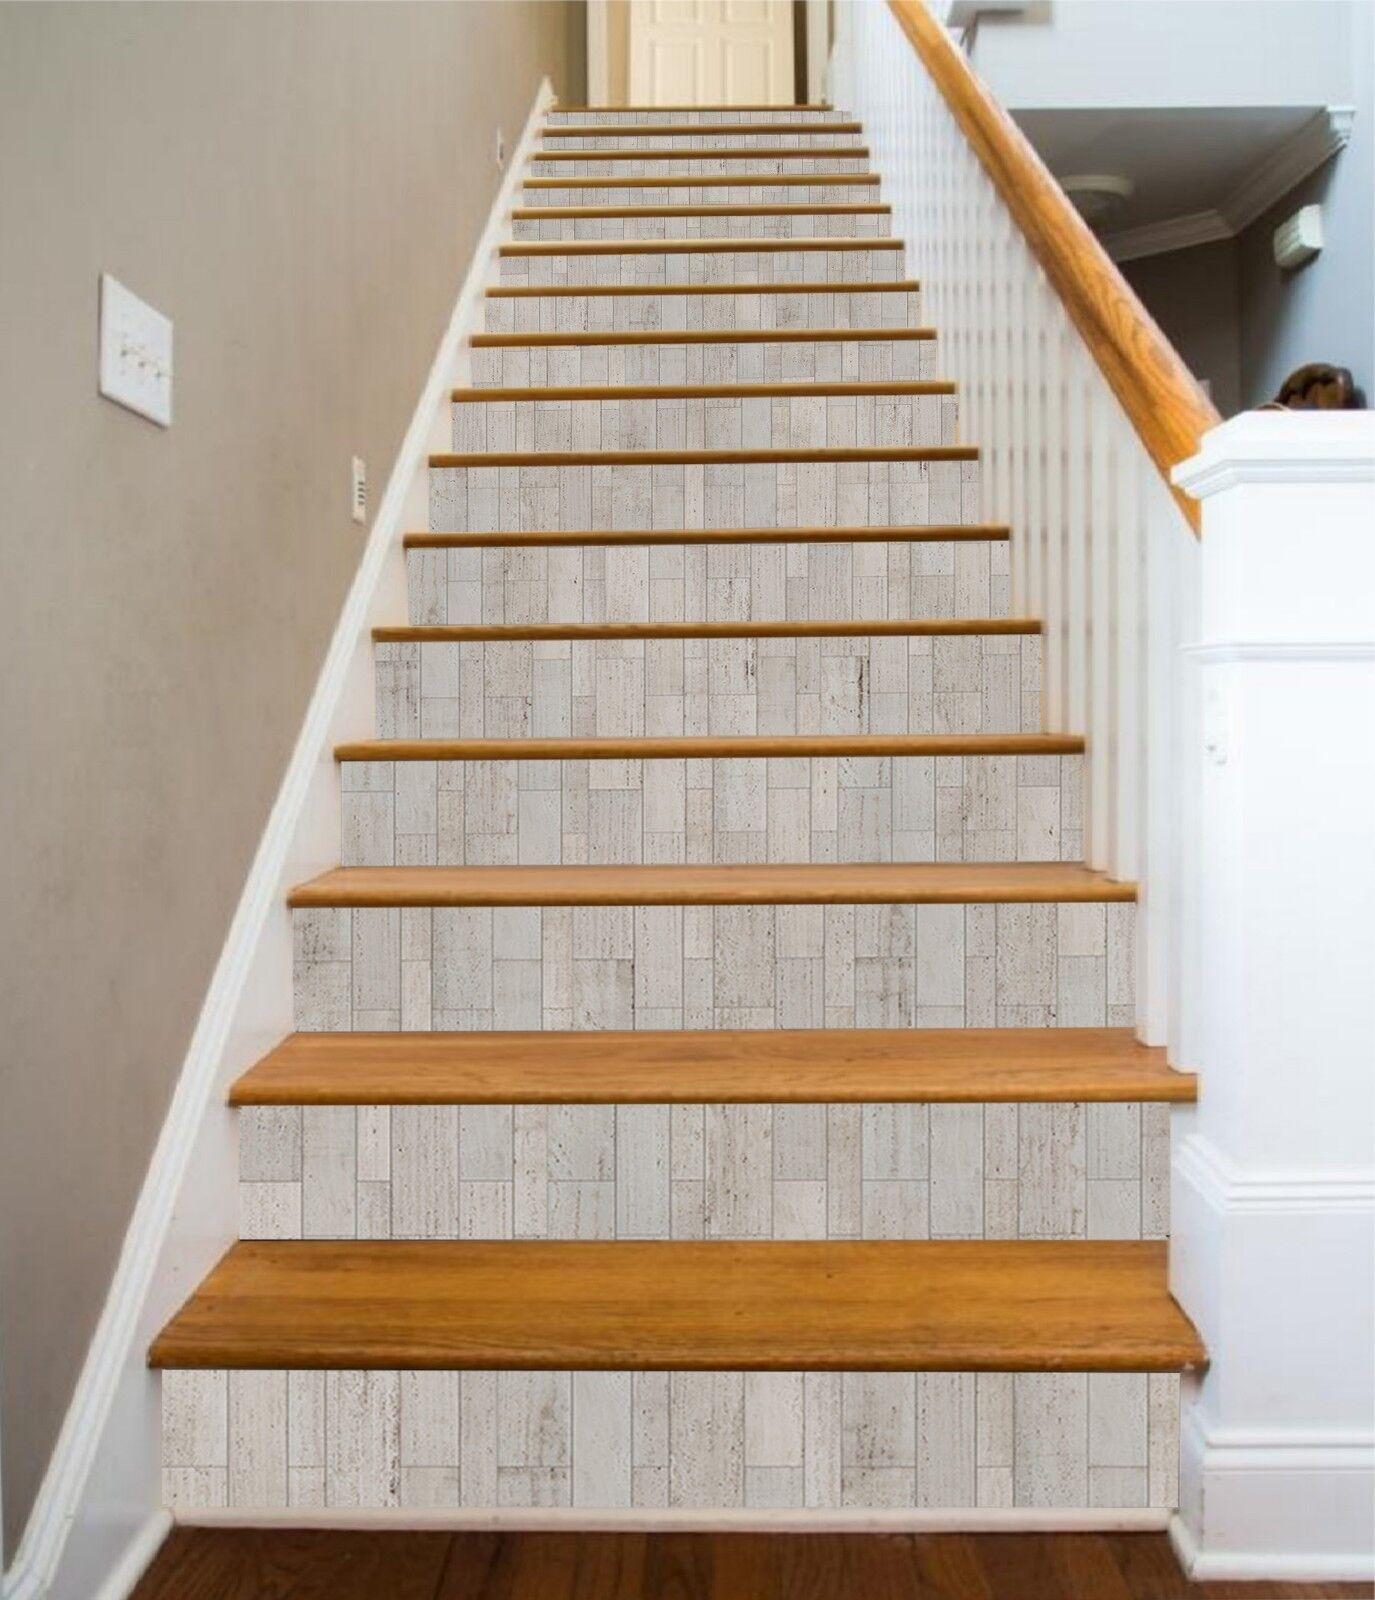 3D Quadrat Hölzer 7 Fliese Marmor Stair Risers Fototapete Vinyl Aufkleber Tapete